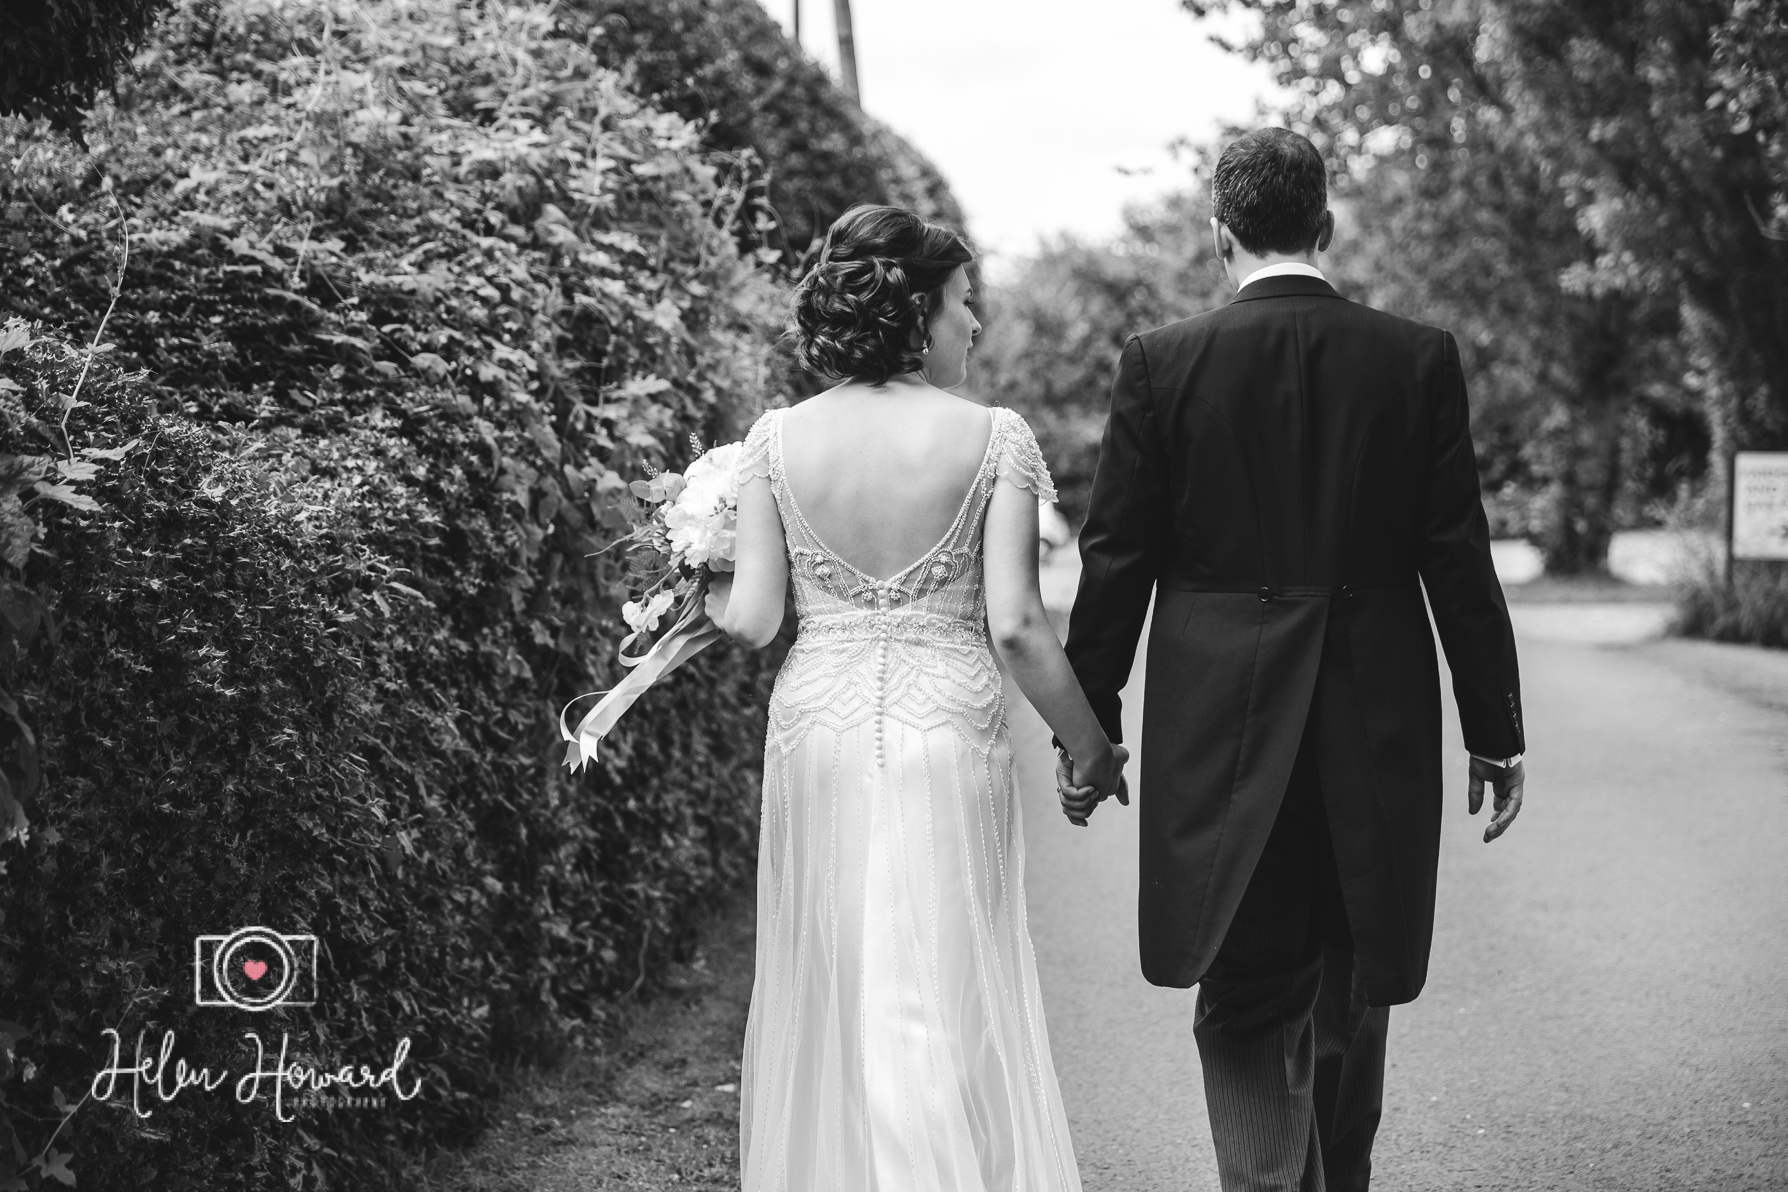 Helen Howard Photography Packington Moor Wedding-82.jpg